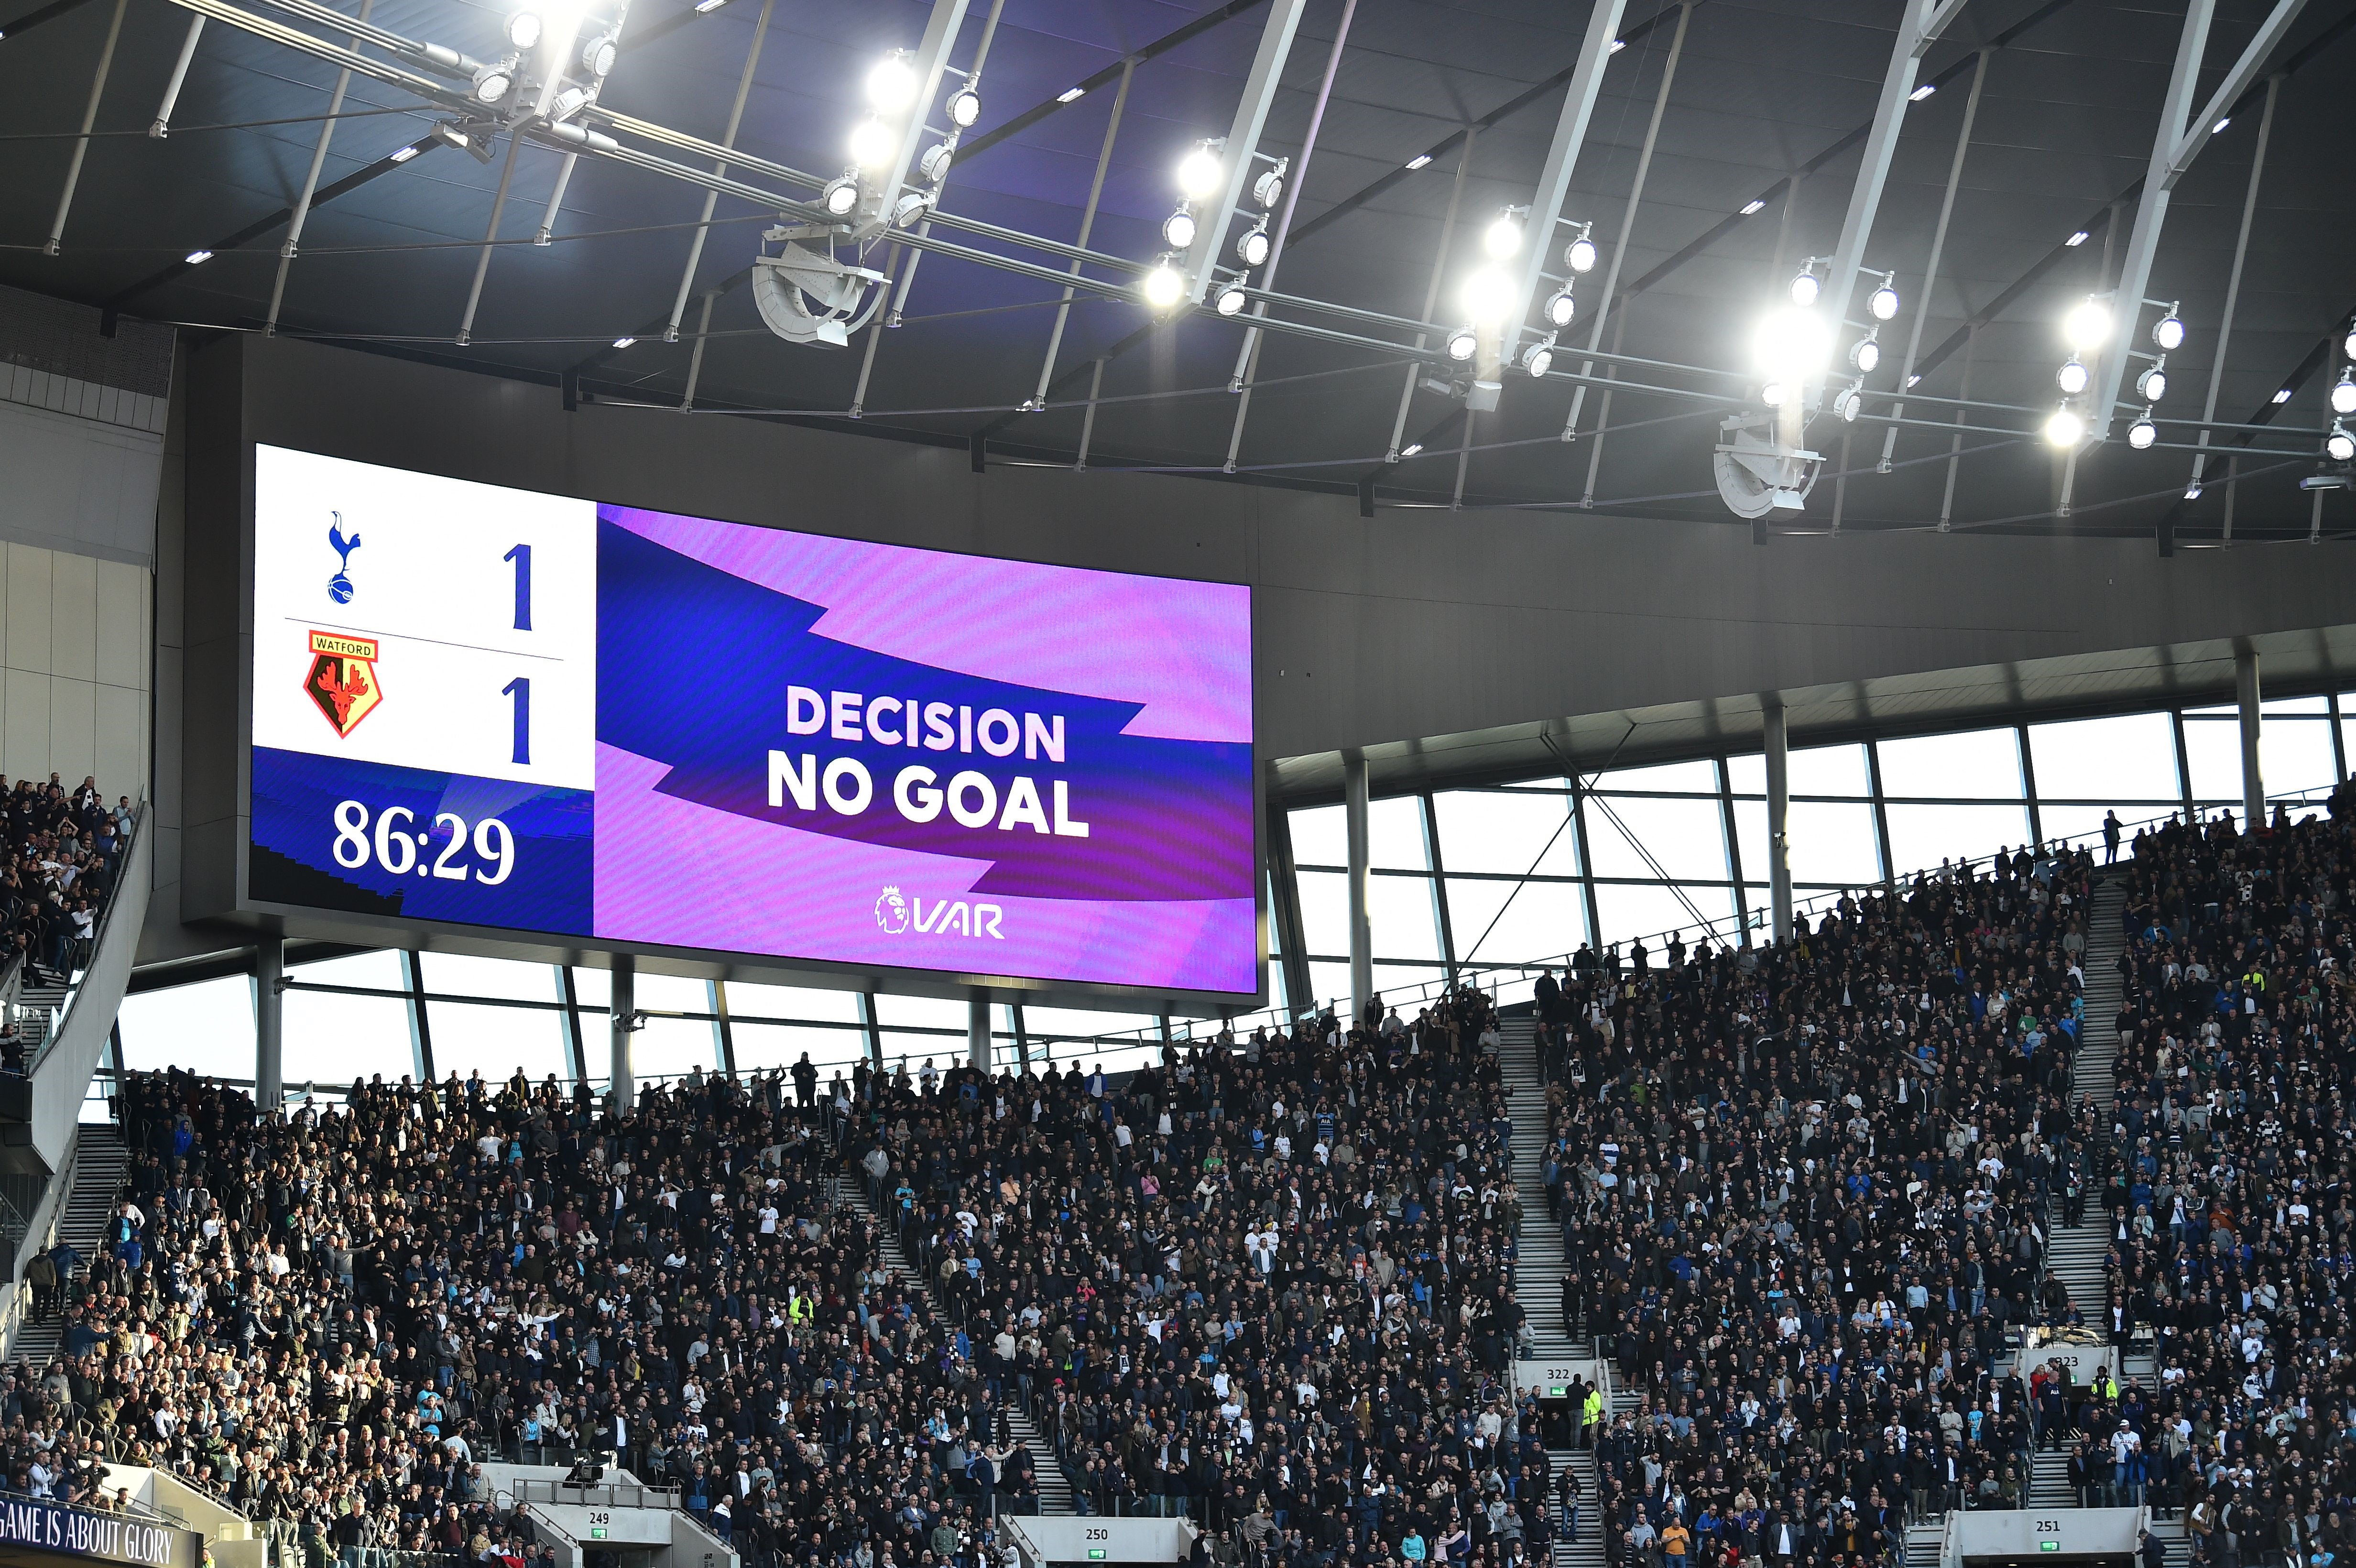 https://i.eurosport.com/2019/10/19/2699015.jpg